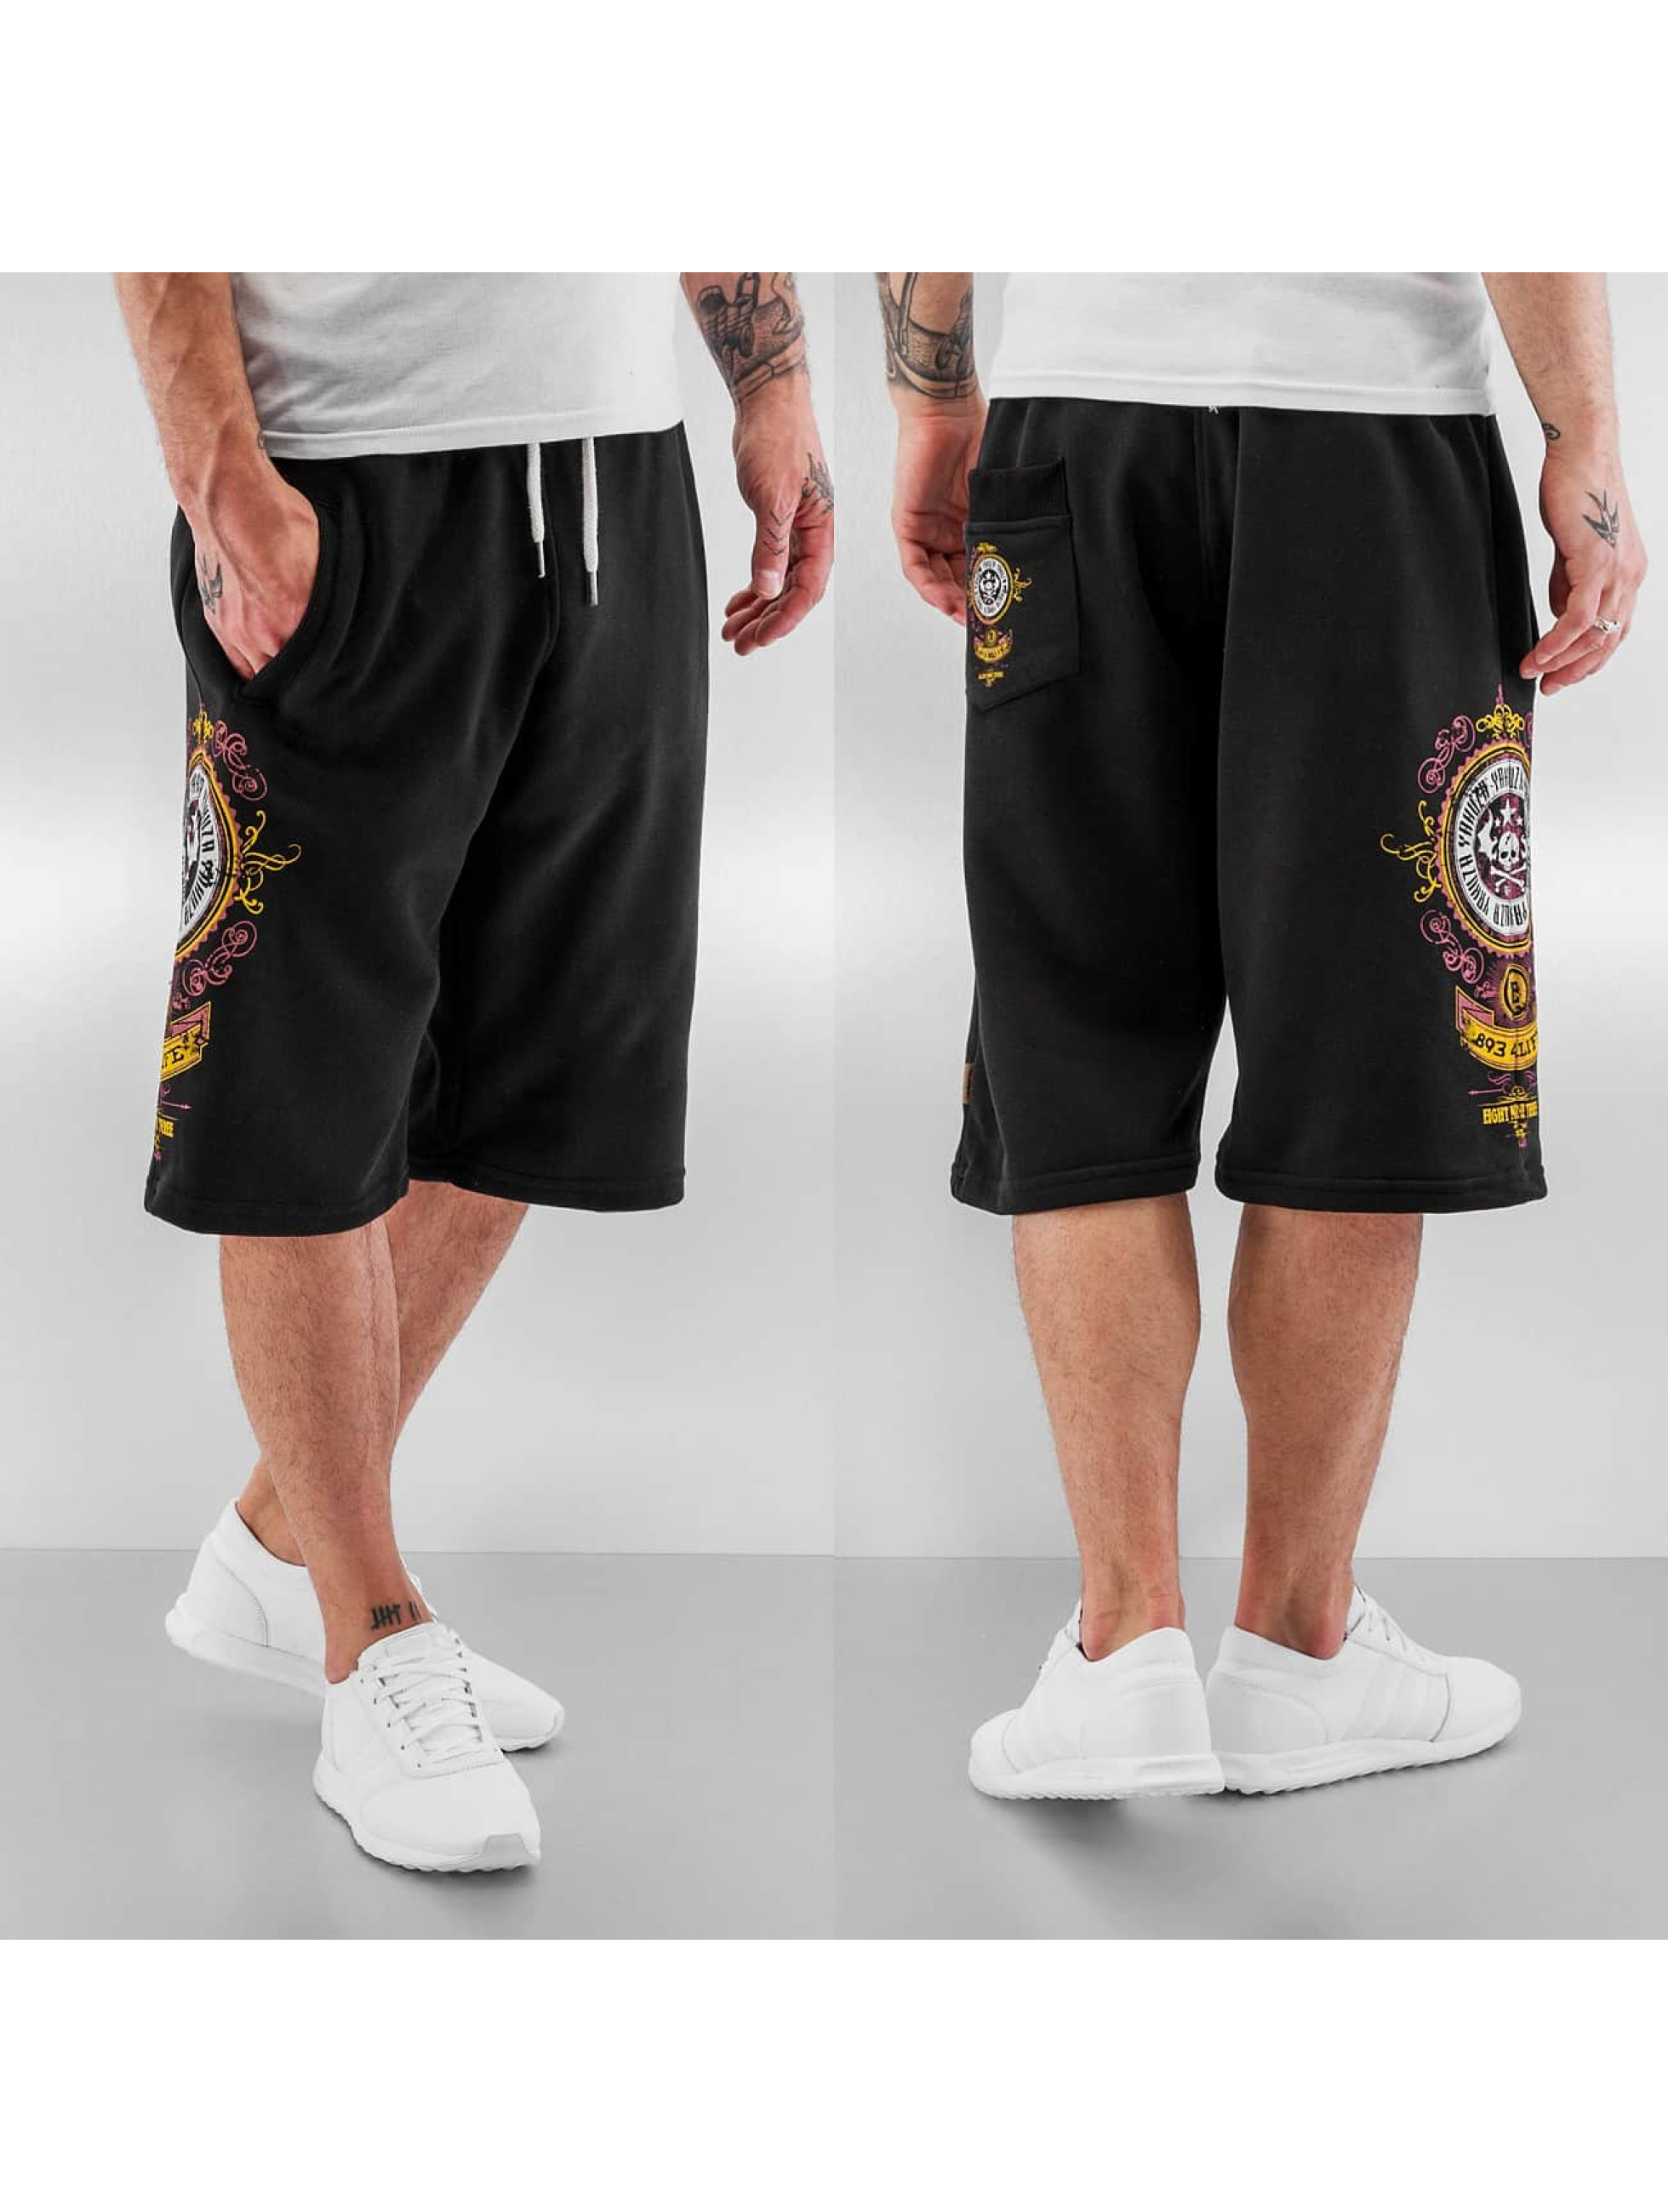 Yakuza Shorts 893 4Life schwarz